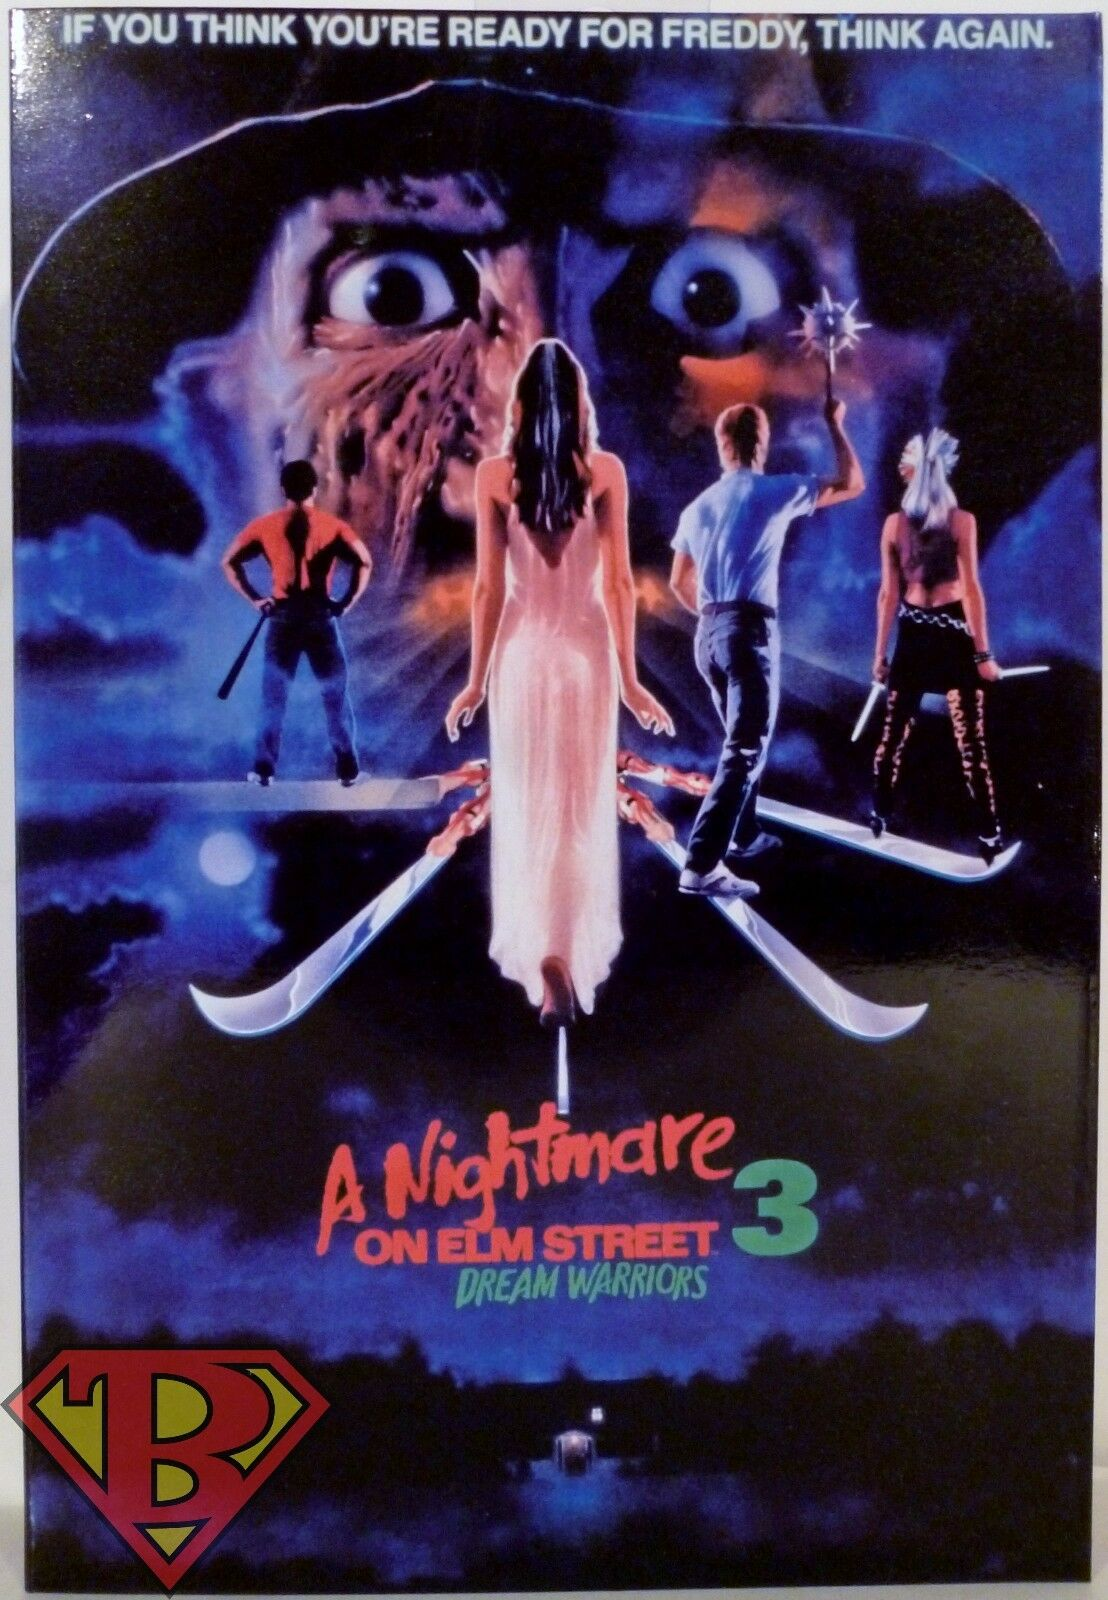 ULTIMATE FROTDY KRUEGER A Nightmare on Elm Street 3 7